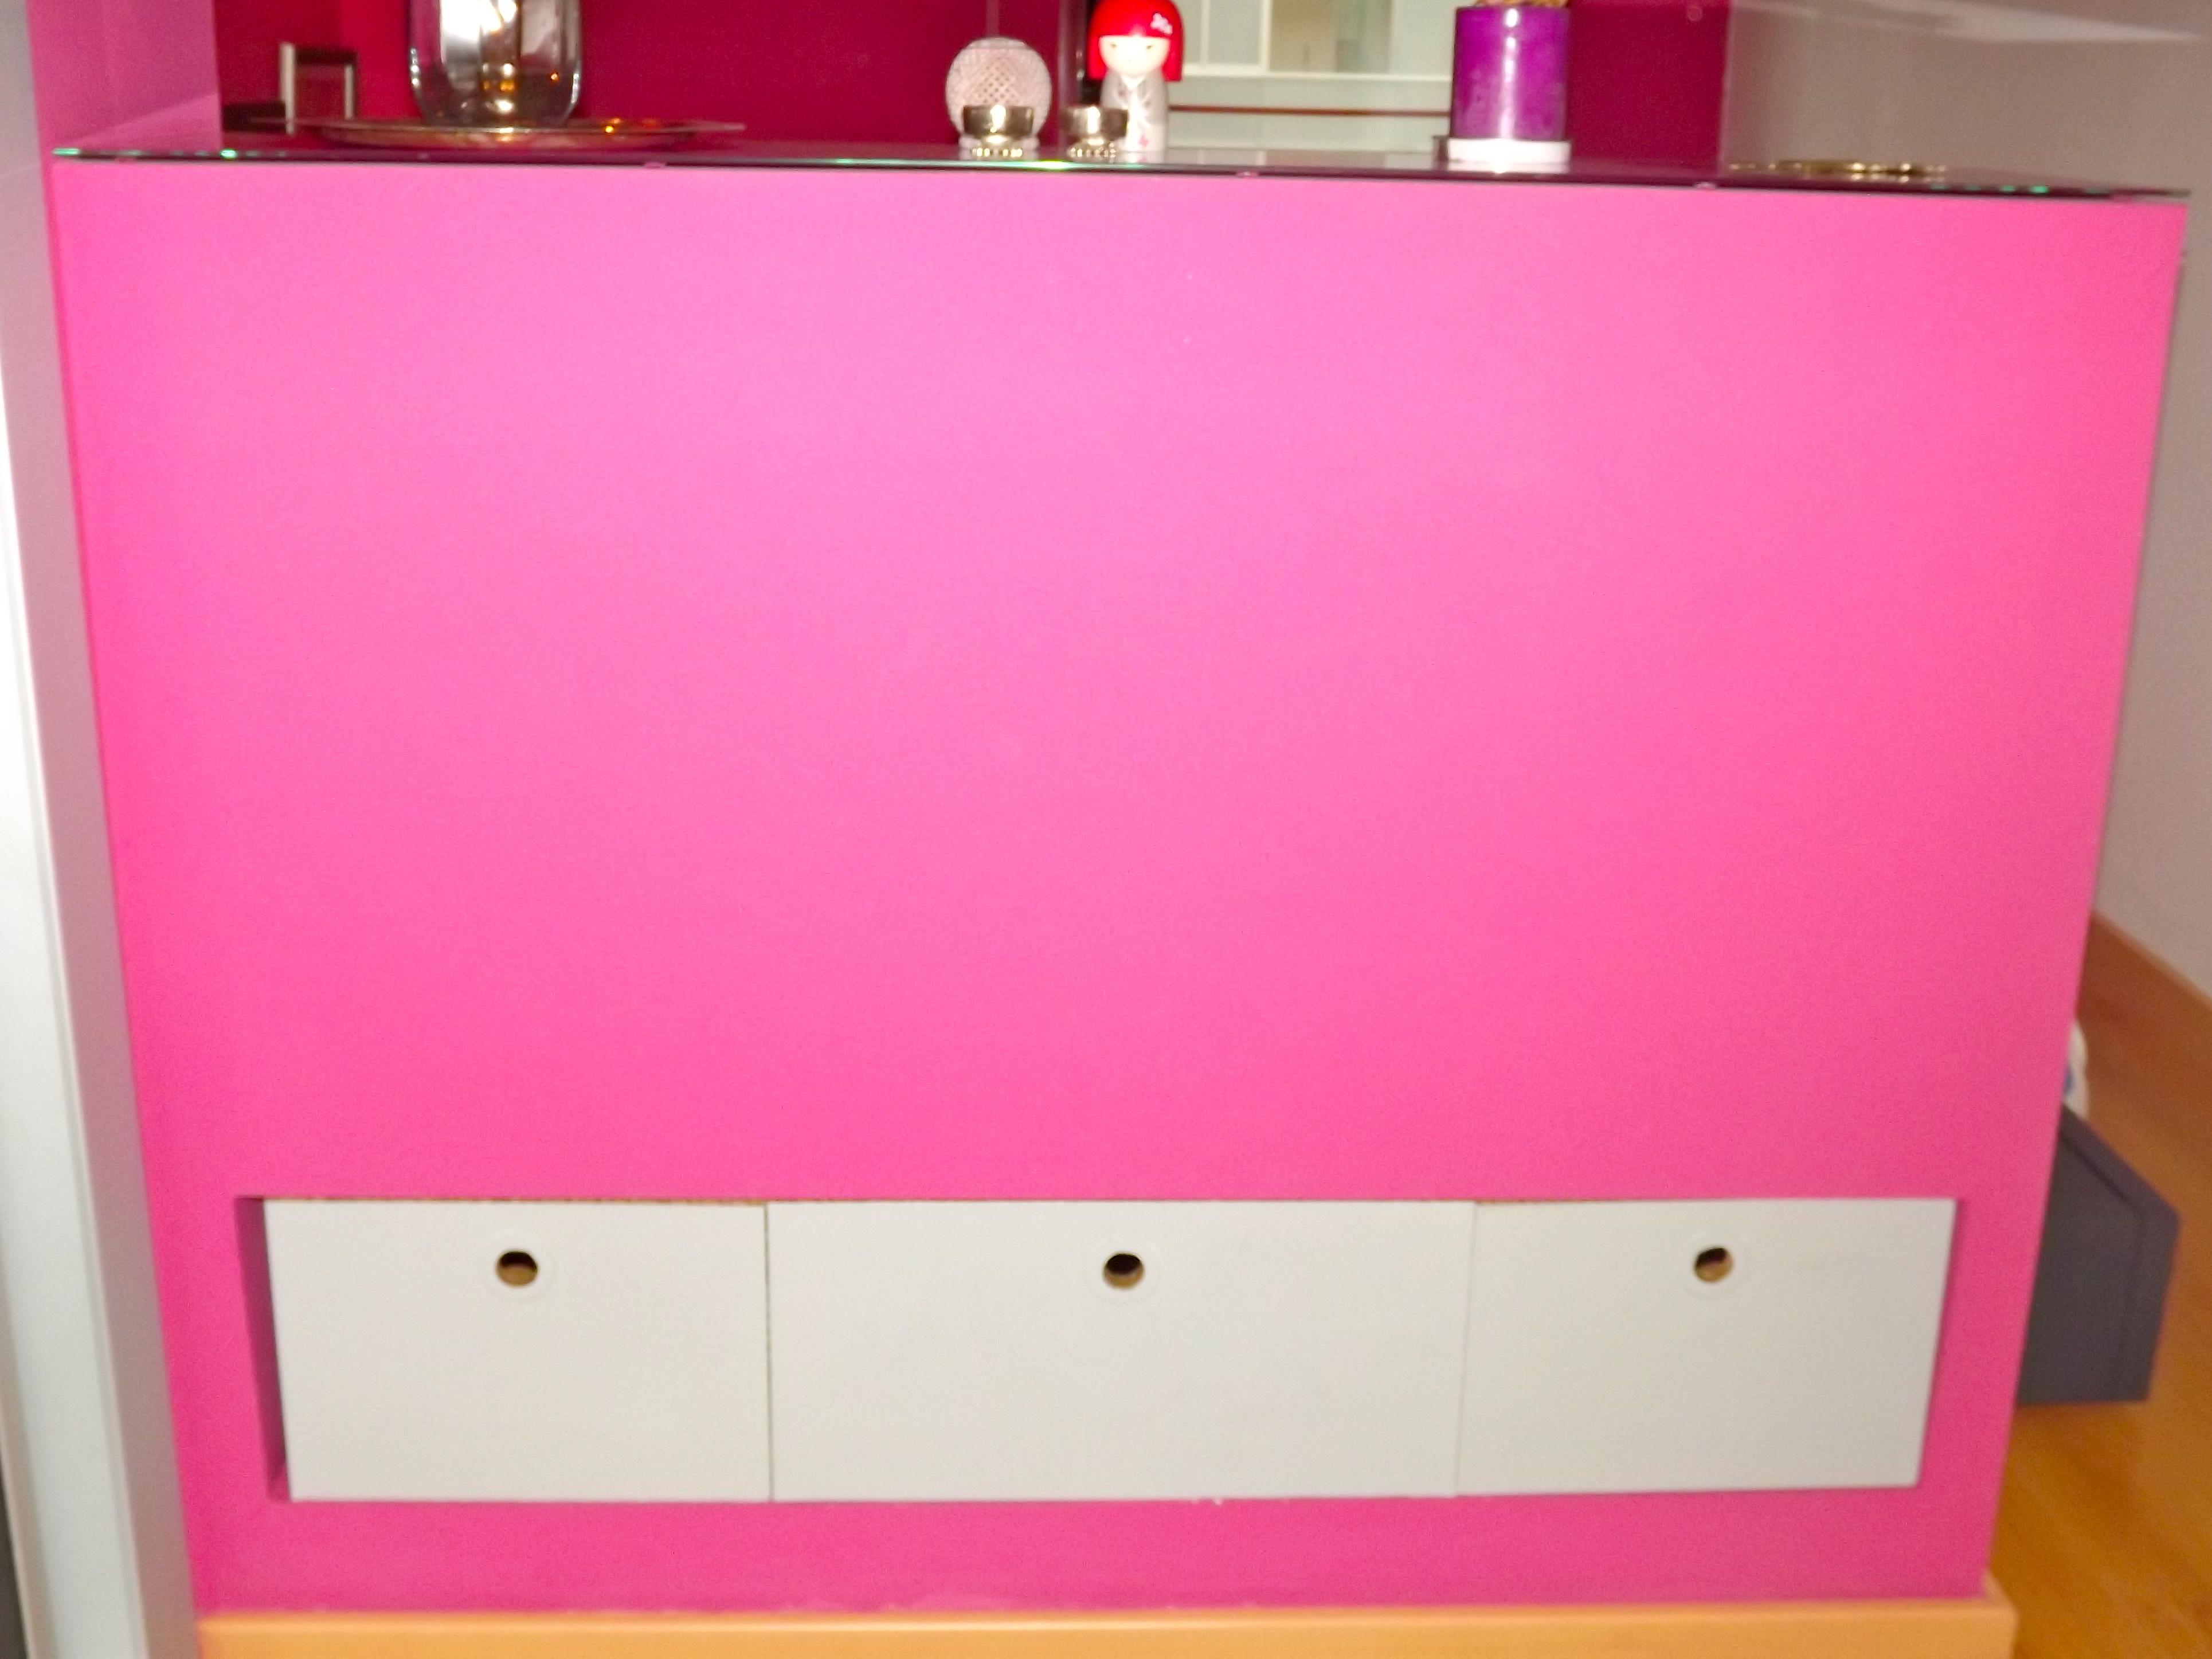 Cajones para mueble de pladur la cartoneria - Mueble de pladur ...